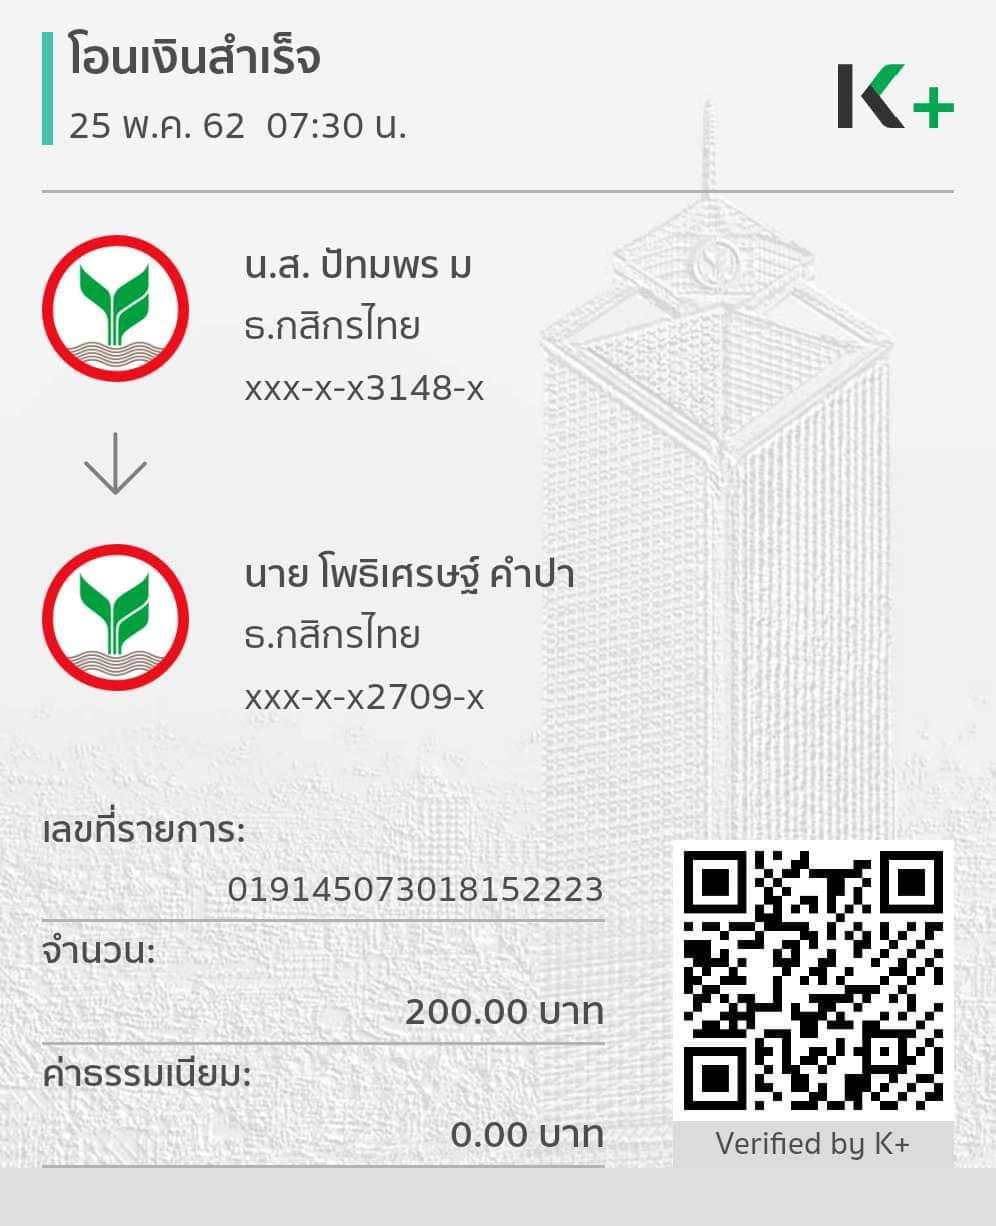 received_359457304926019.jpeg